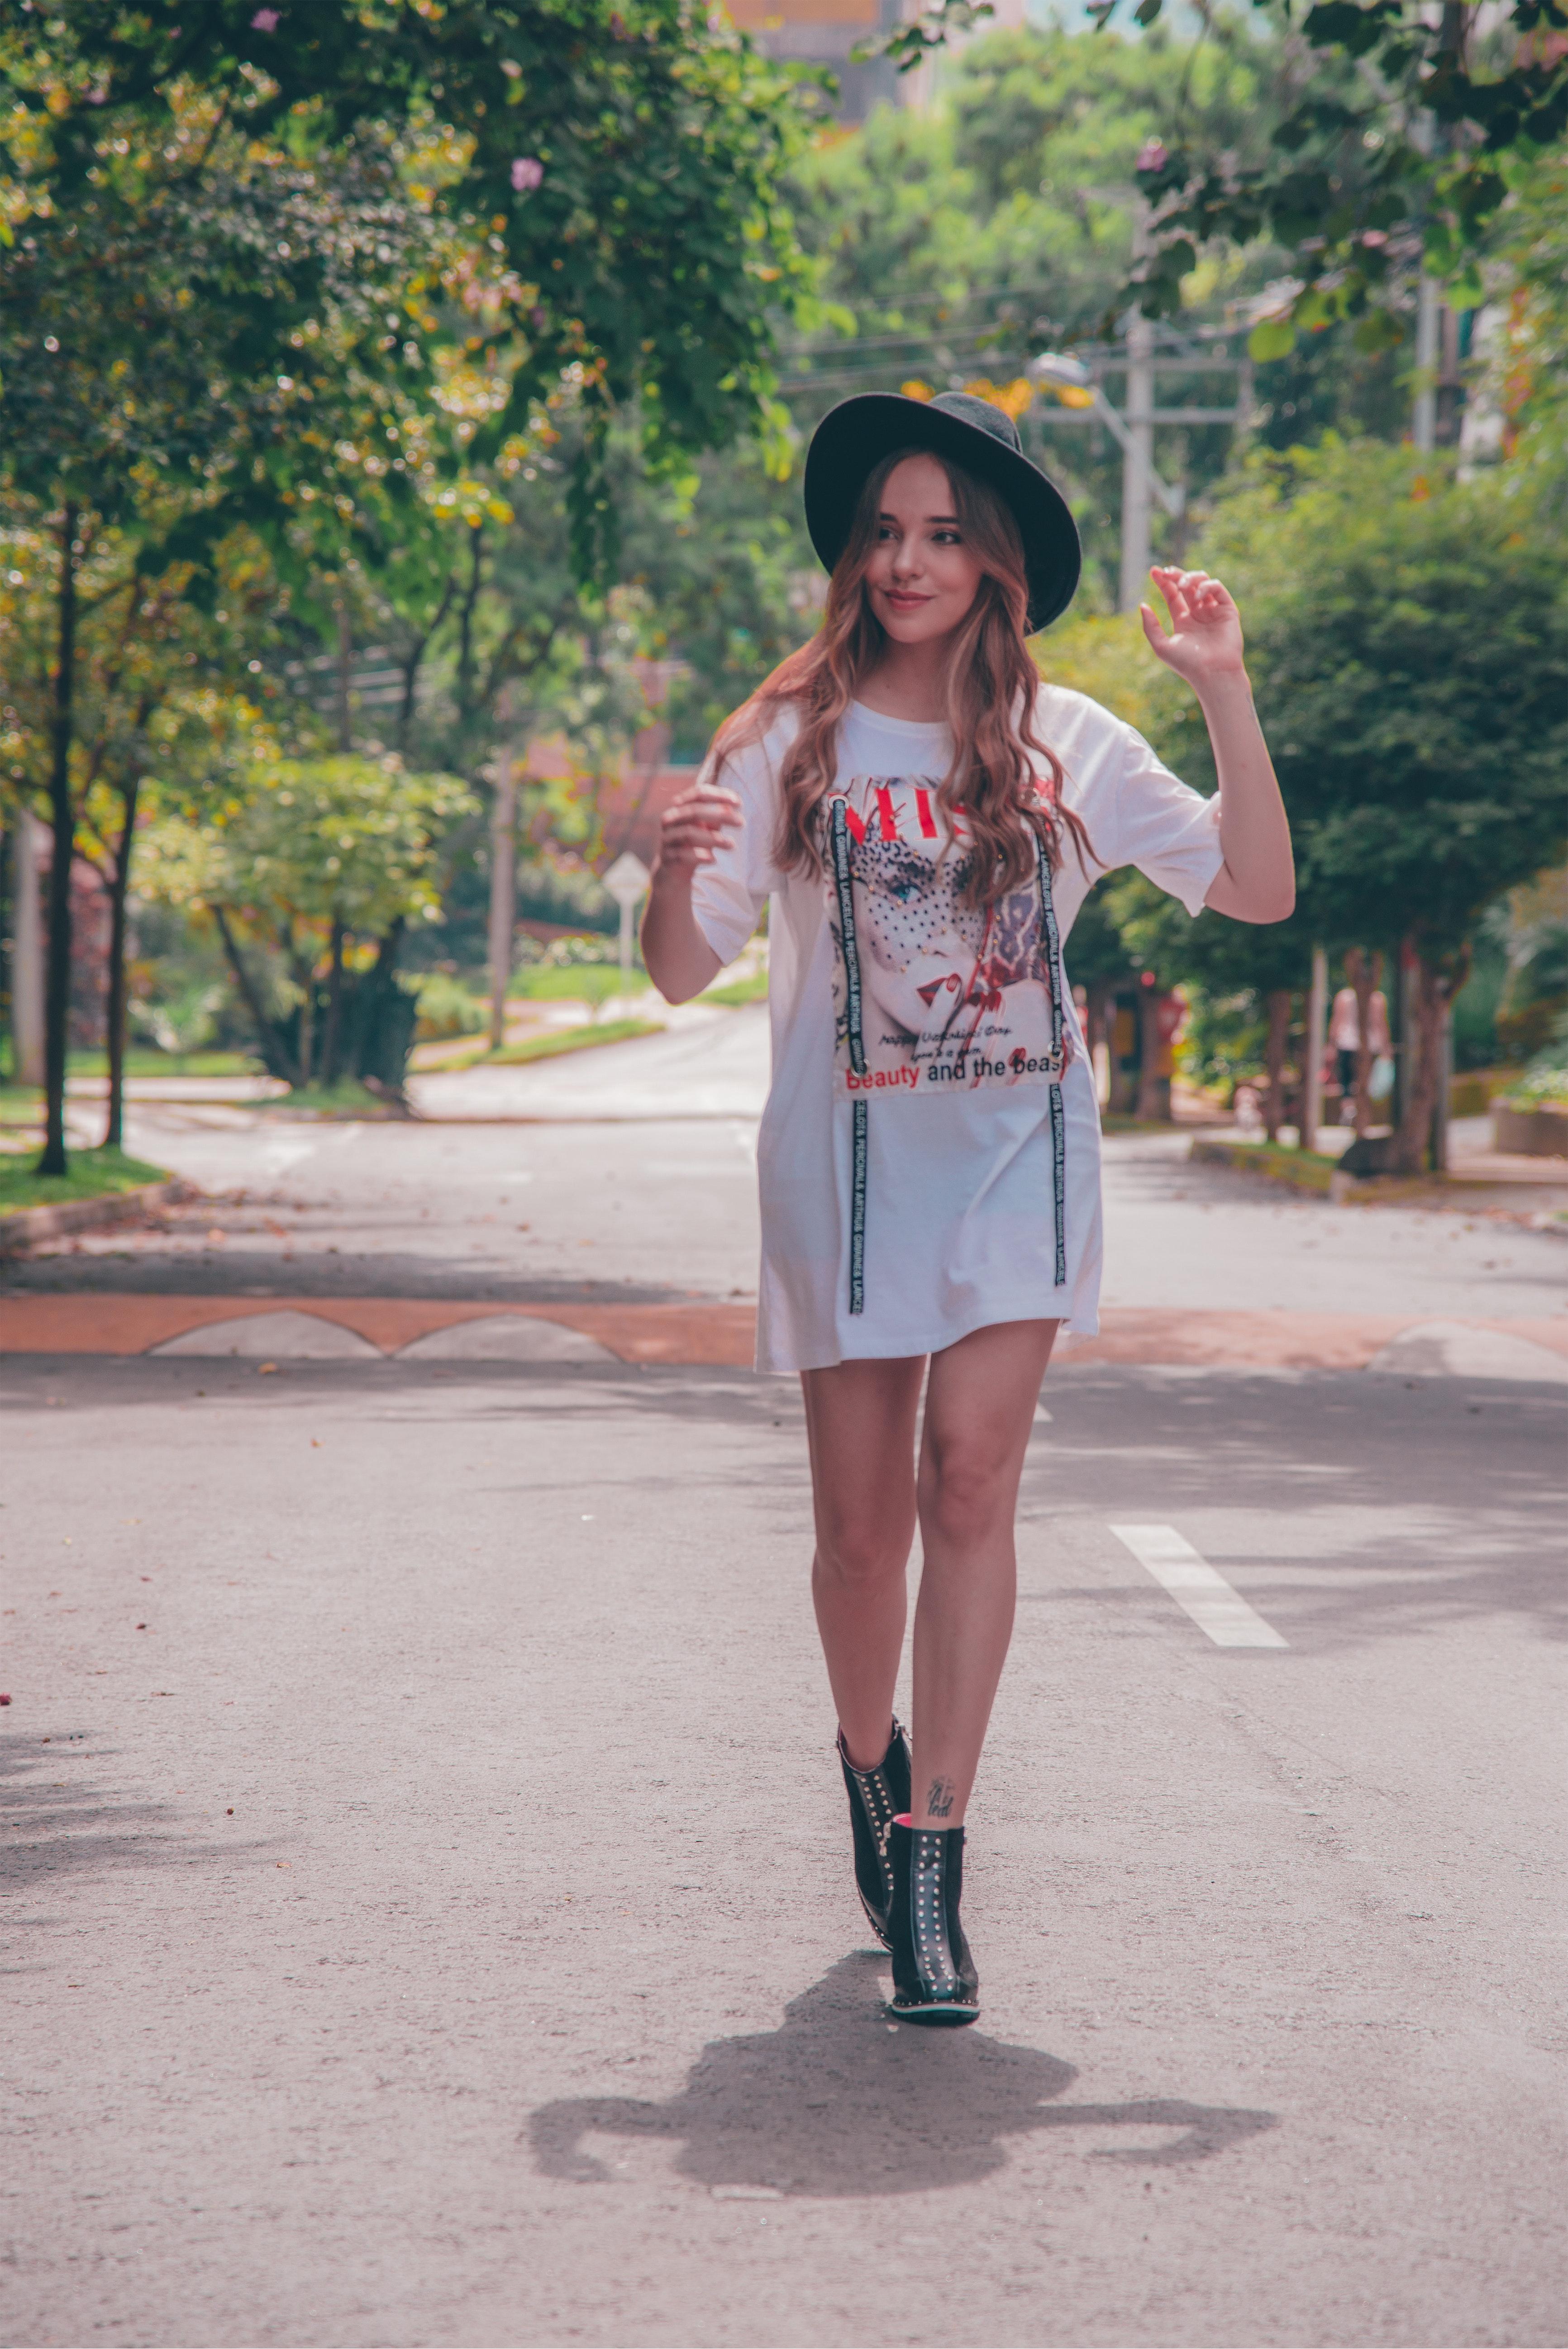 Sexy Blonde Woman Walking Away — Stock Photo © brickrena